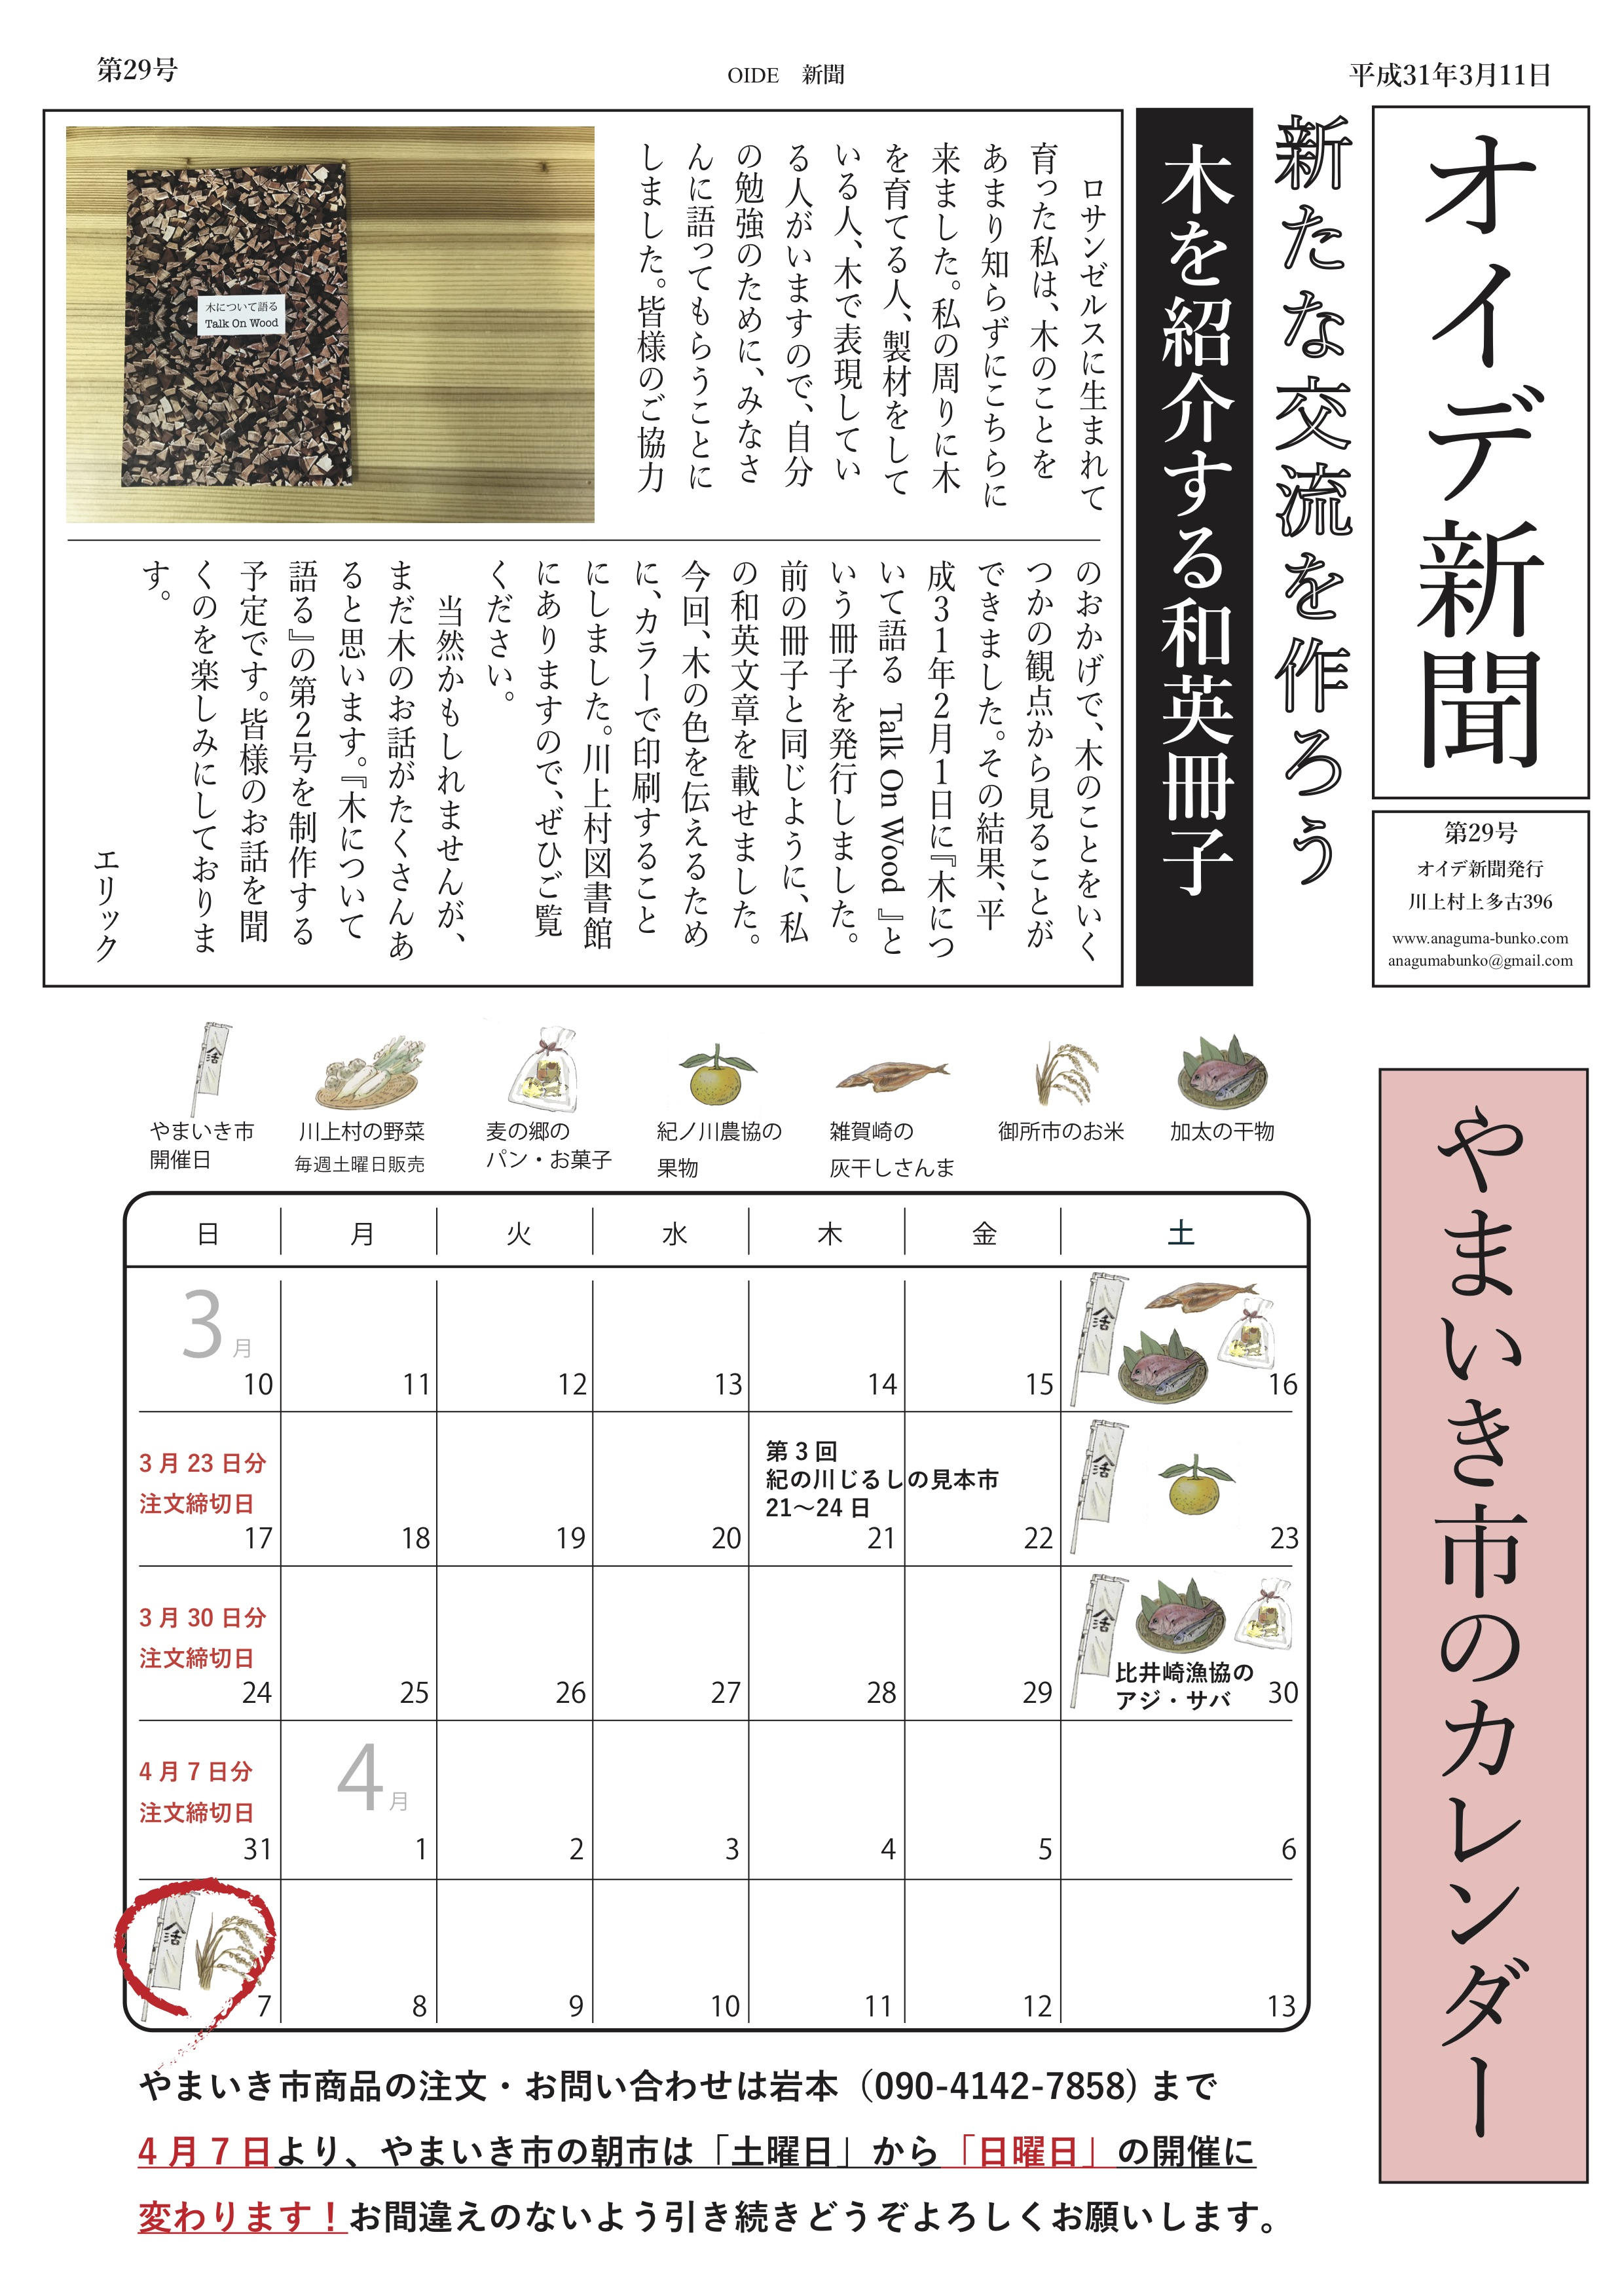 oide新聞31年3月号表.jpg